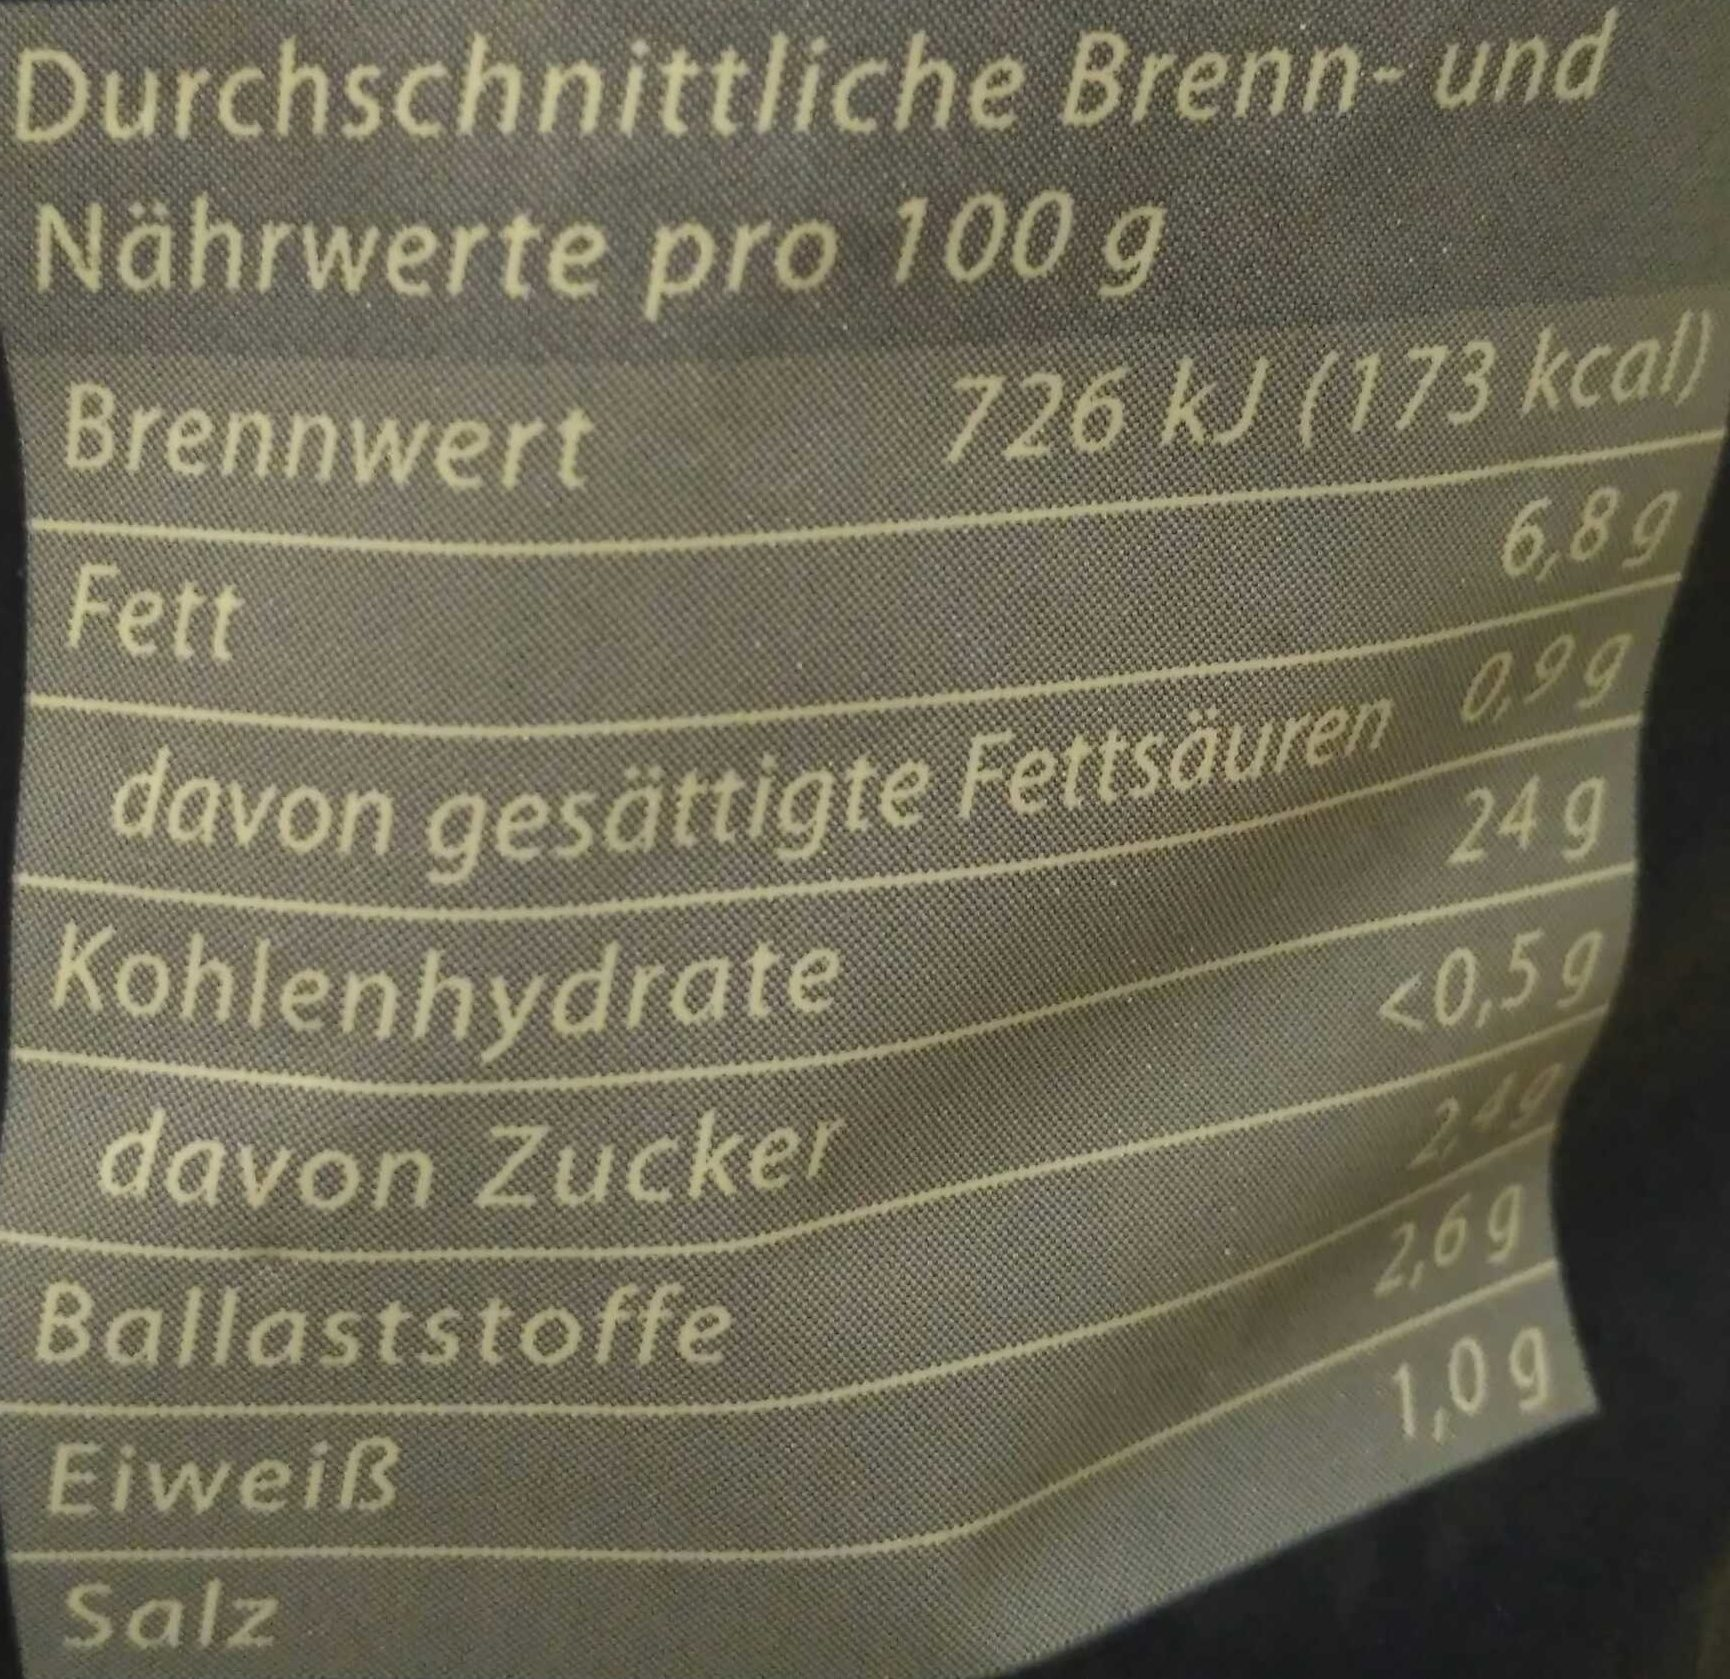 Kartoffel Kcal kartoffel locken küsten gold 450 g